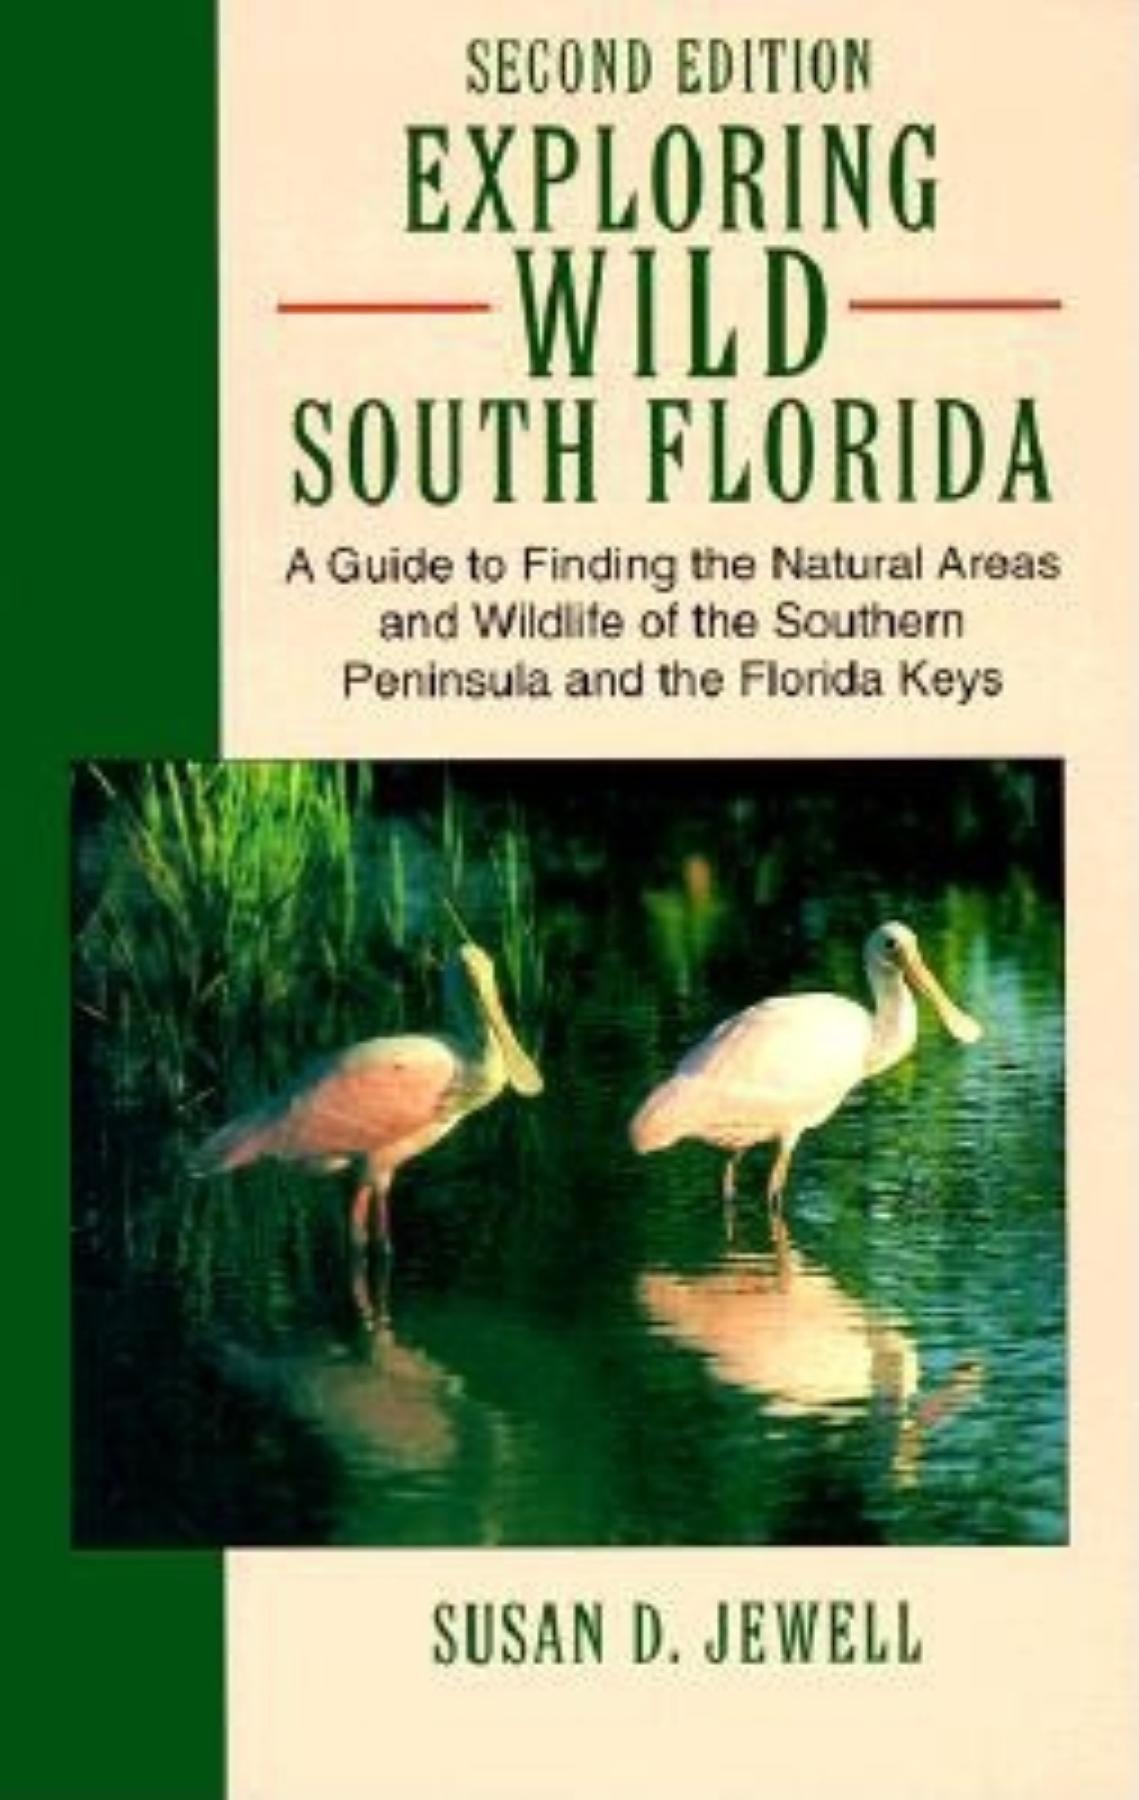 Wild About Florida: South Florida